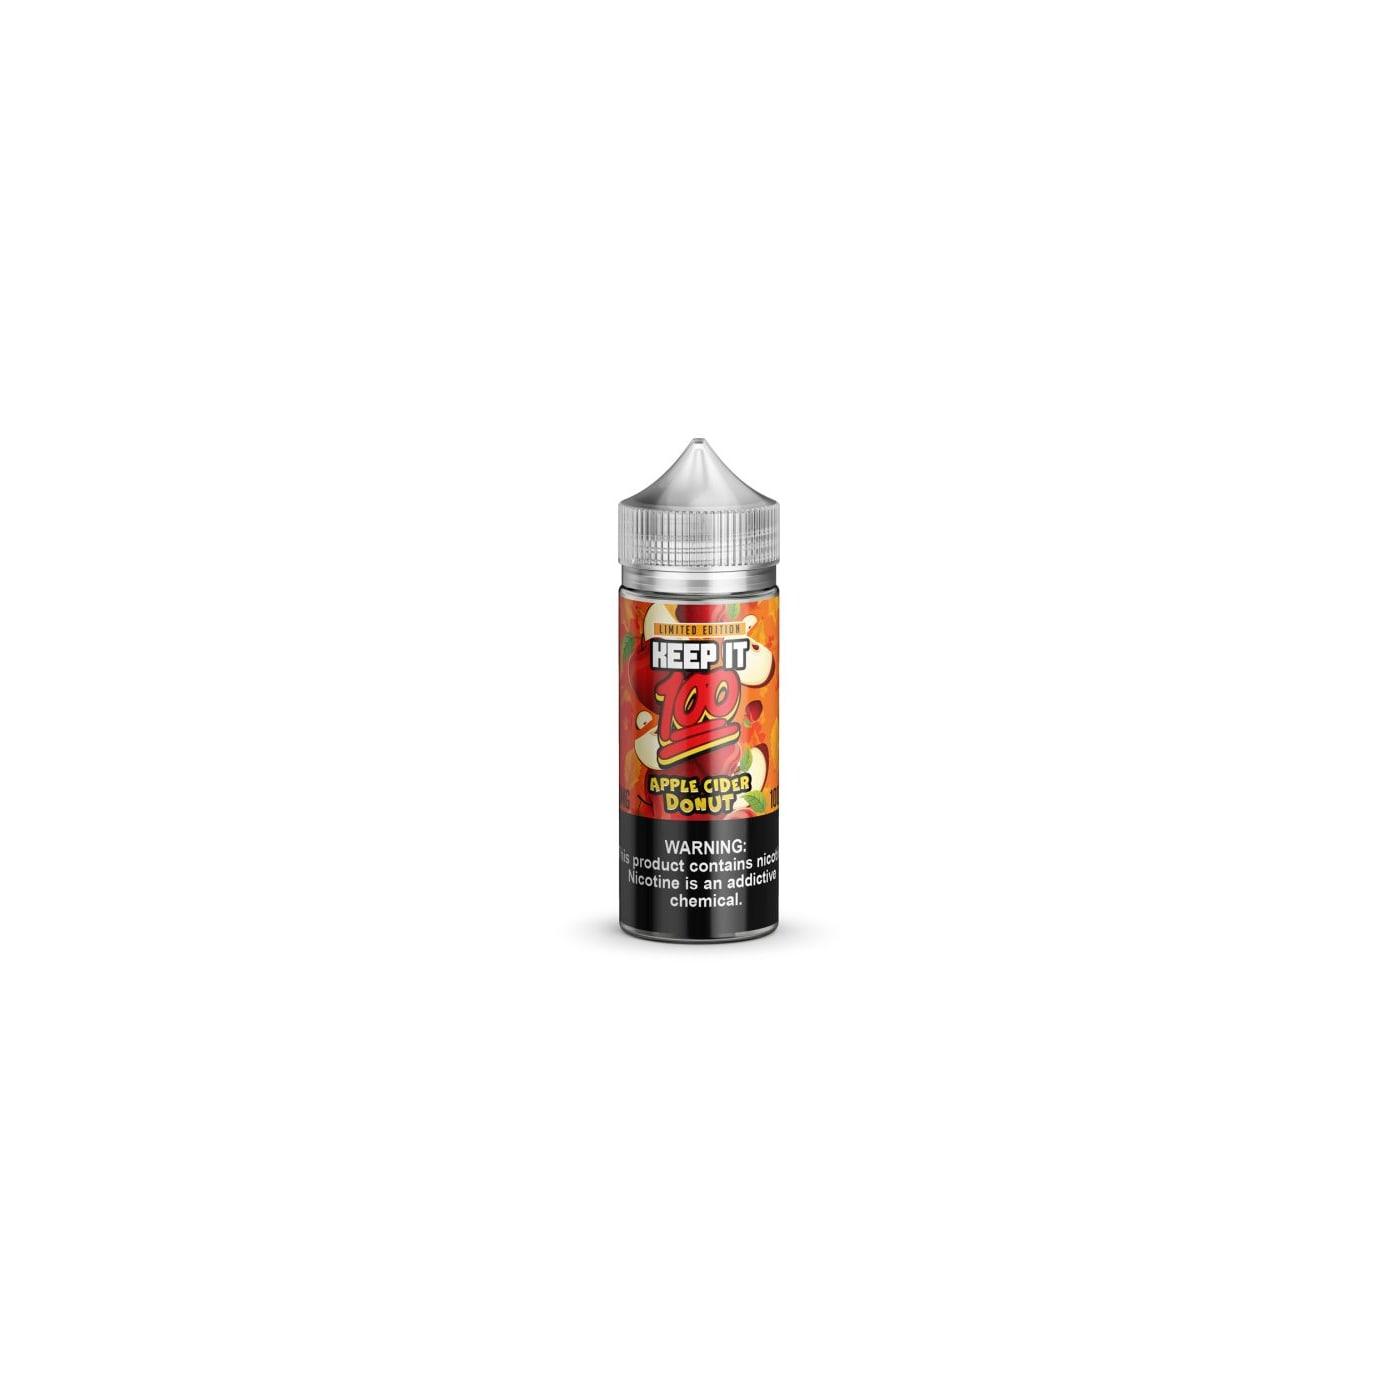 Apple Cider Donut 100ml E-liquid by Keep It 100